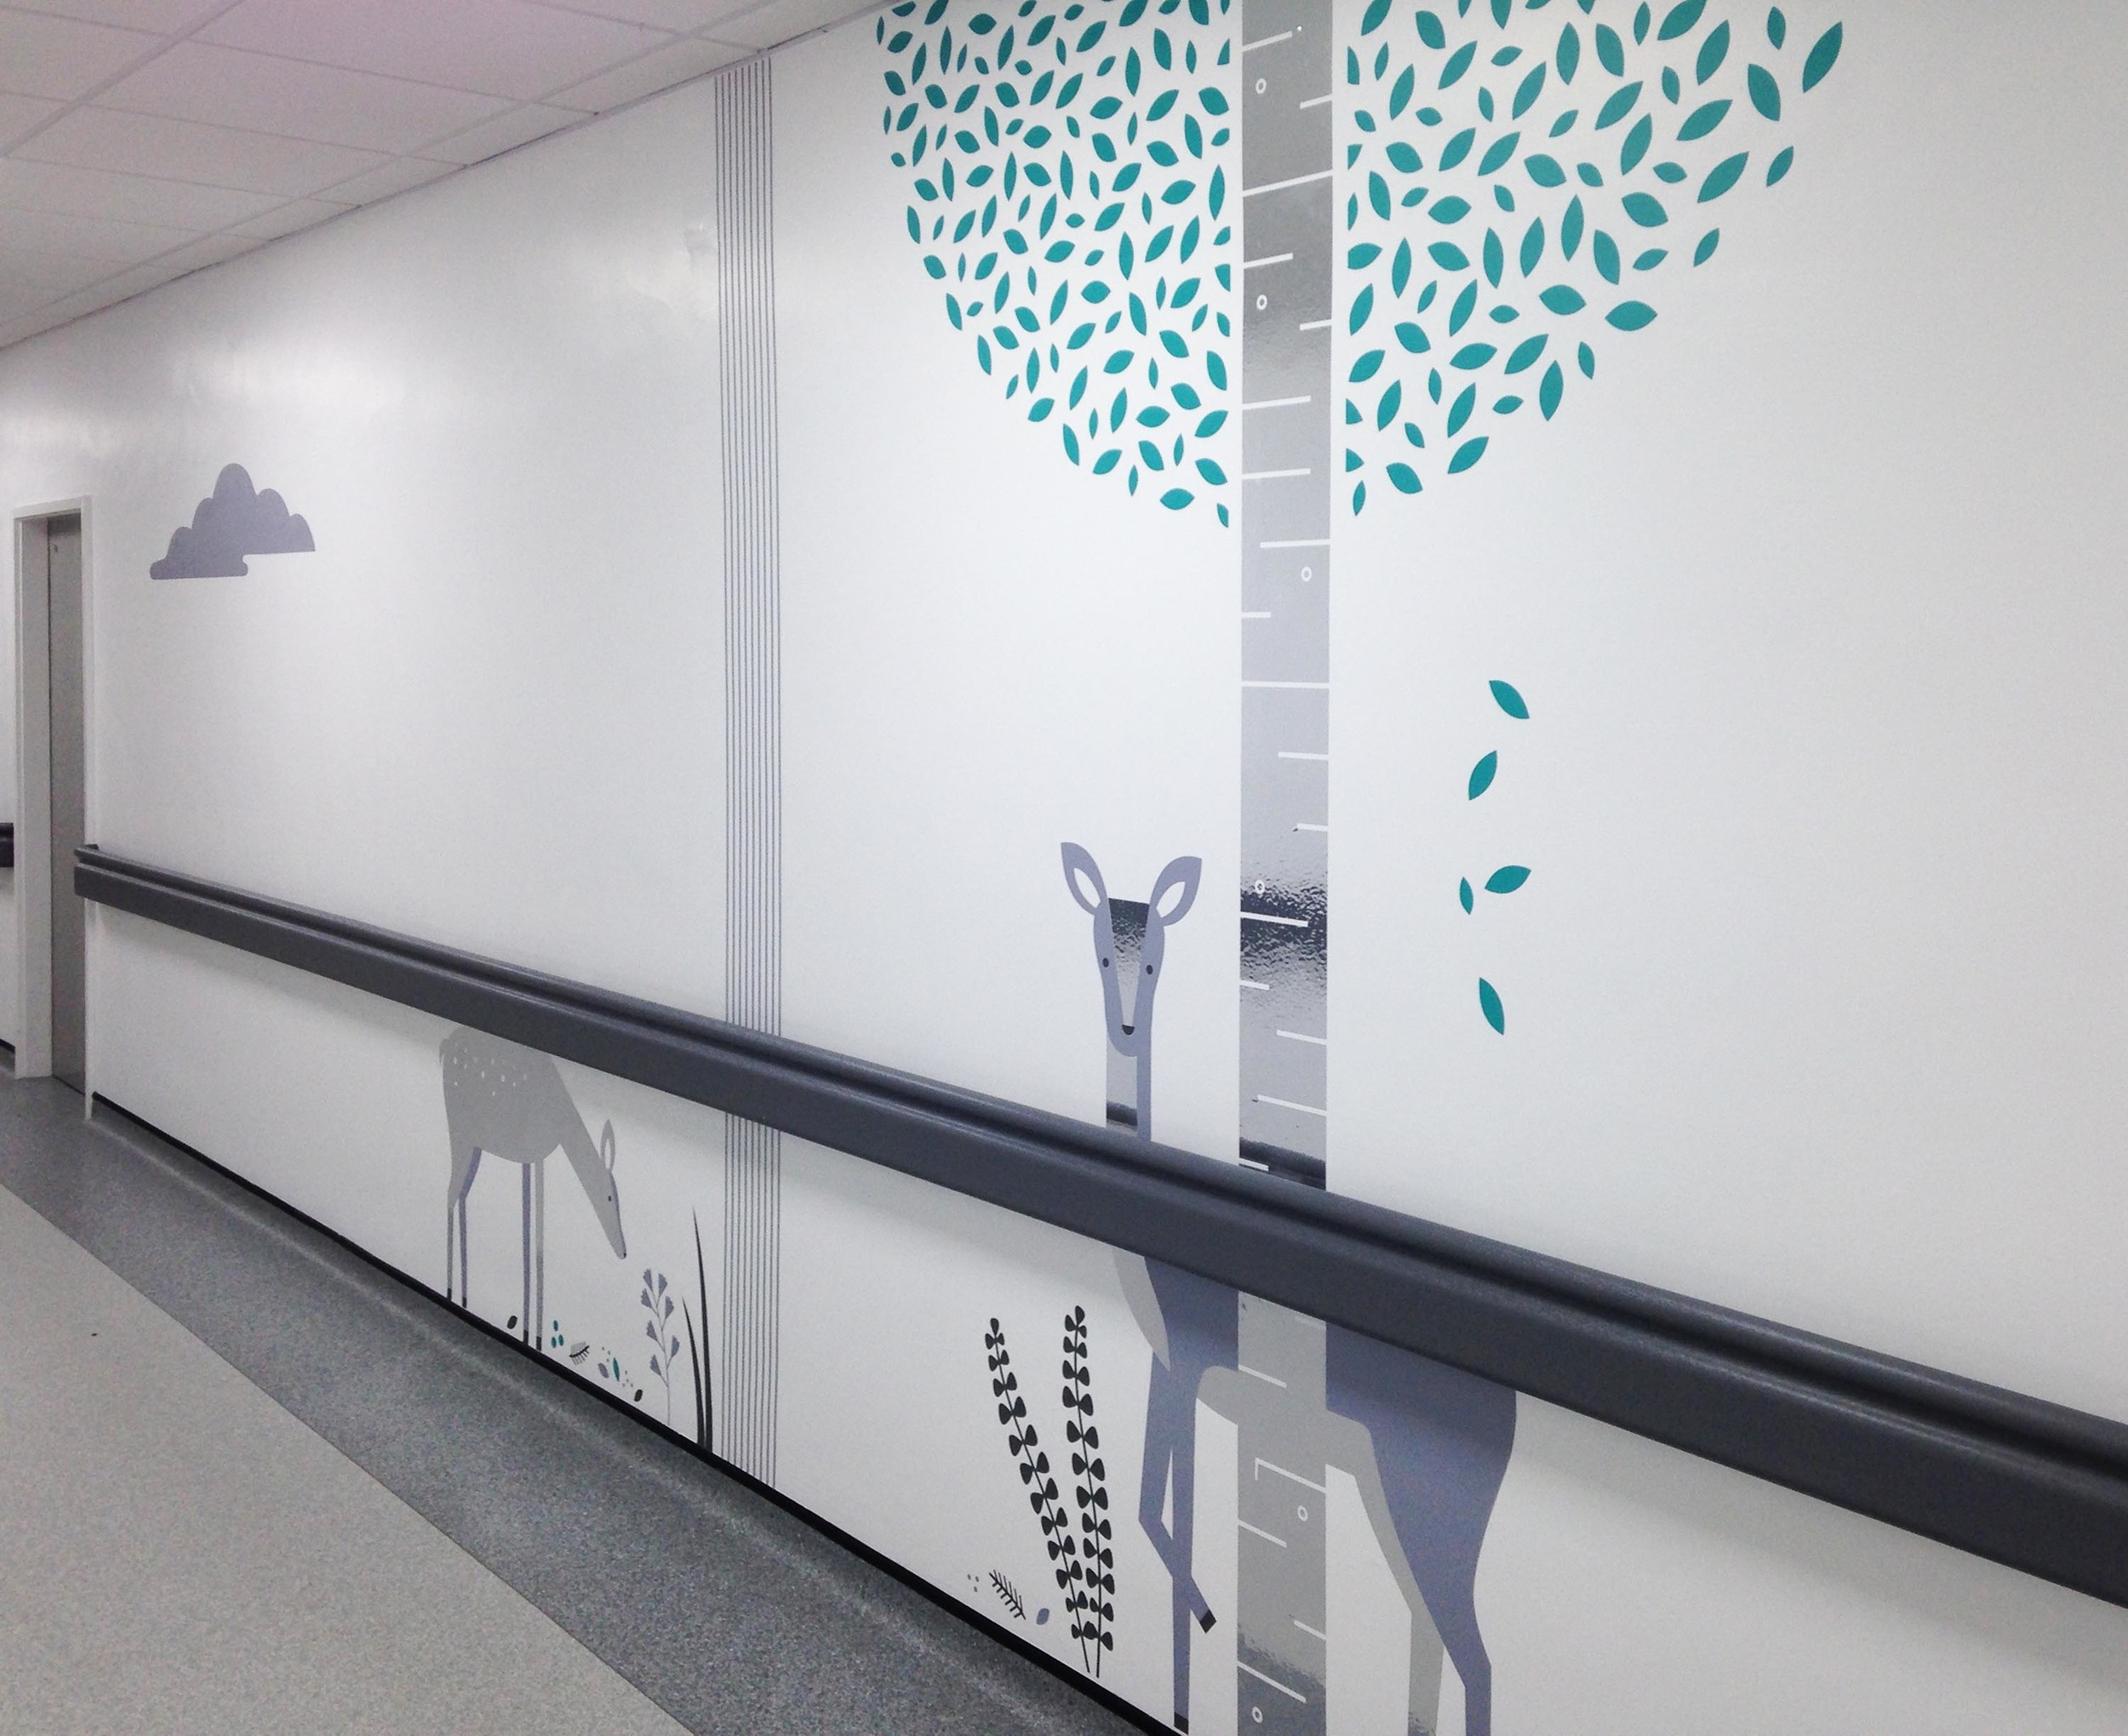 Fracture Corridor Photo 1-hospital-illustration-wall-graphics.jpg